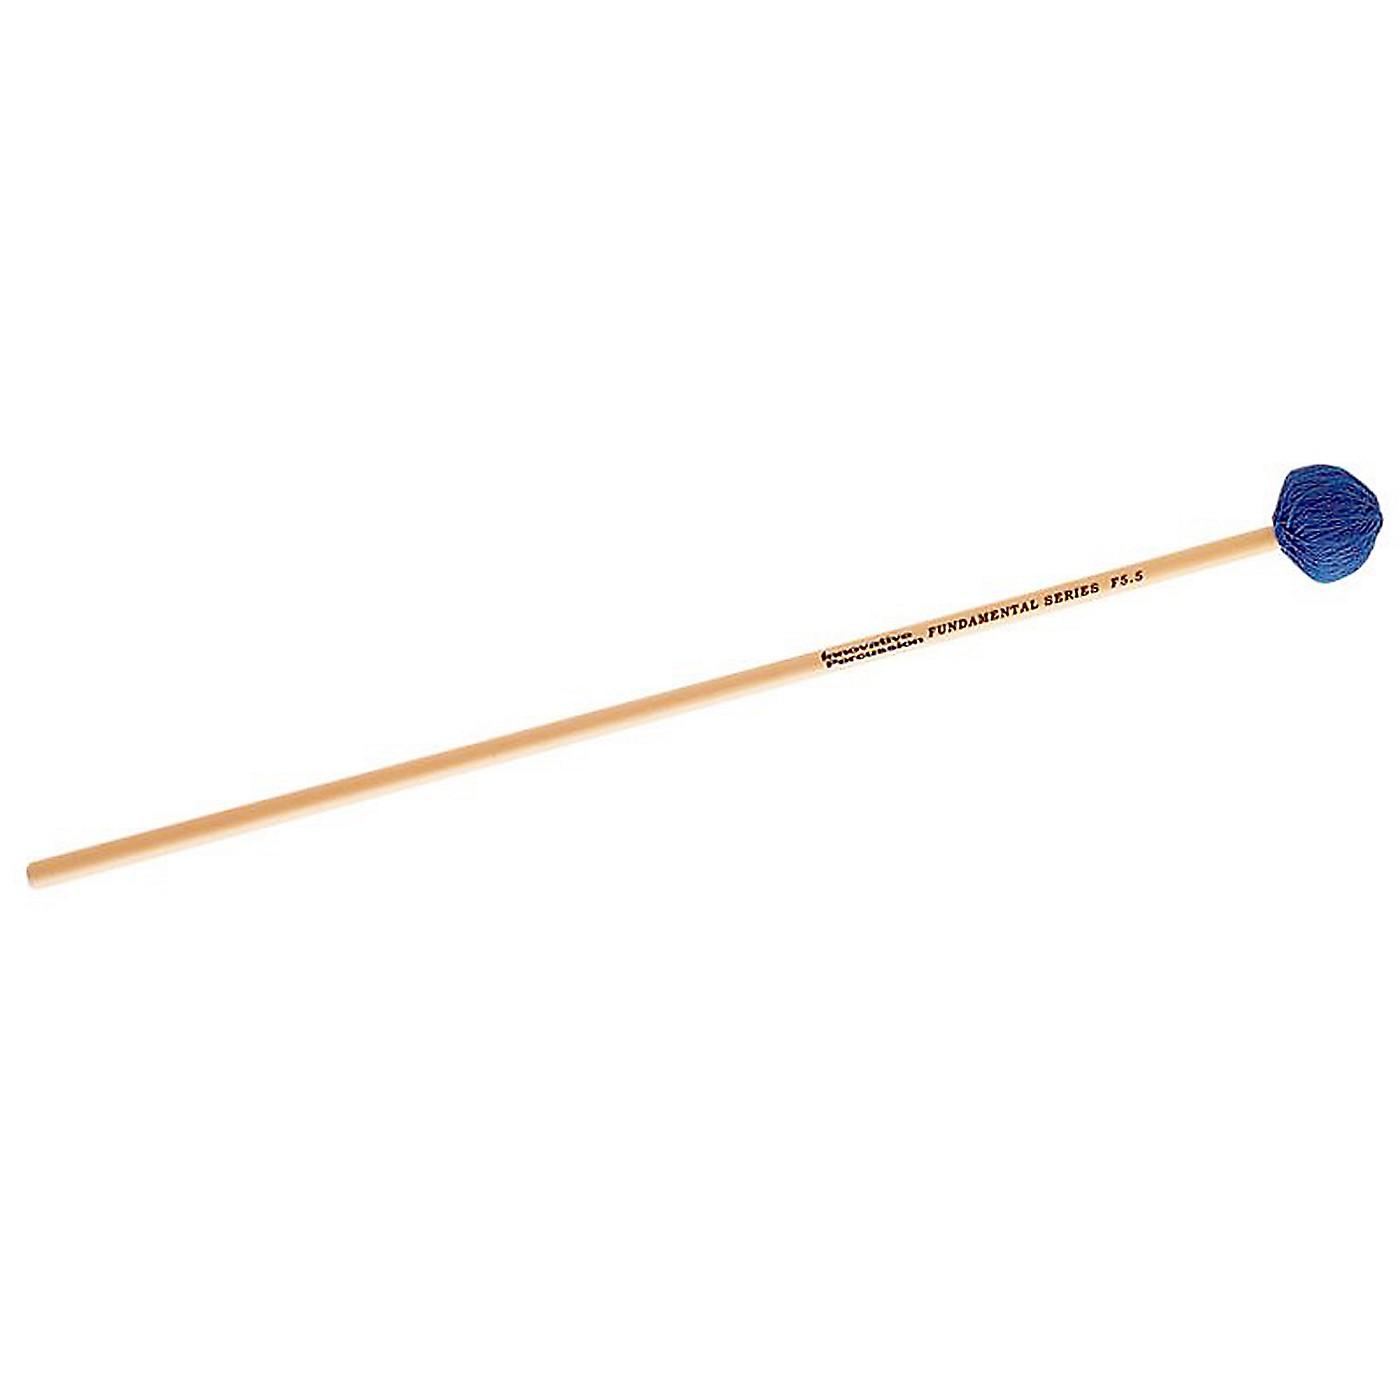 Innovative Percussion Fundamental Series Blue Cord Vibraphone Mallets thumbnail